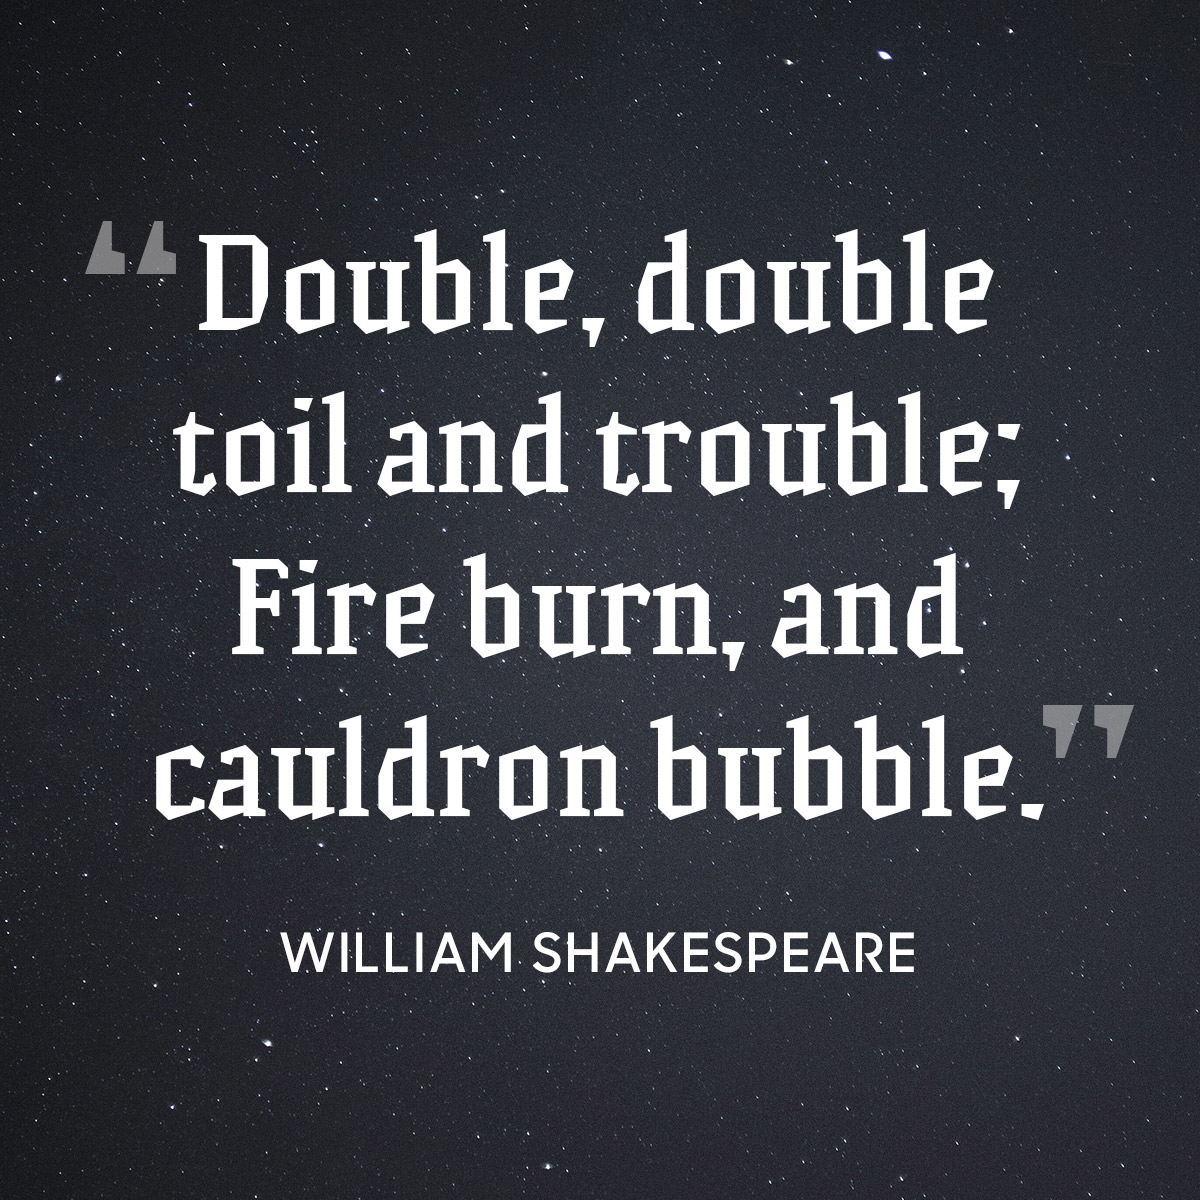 Shakespeare Halloween Quotes: 14 Spooky Halloween Quotes